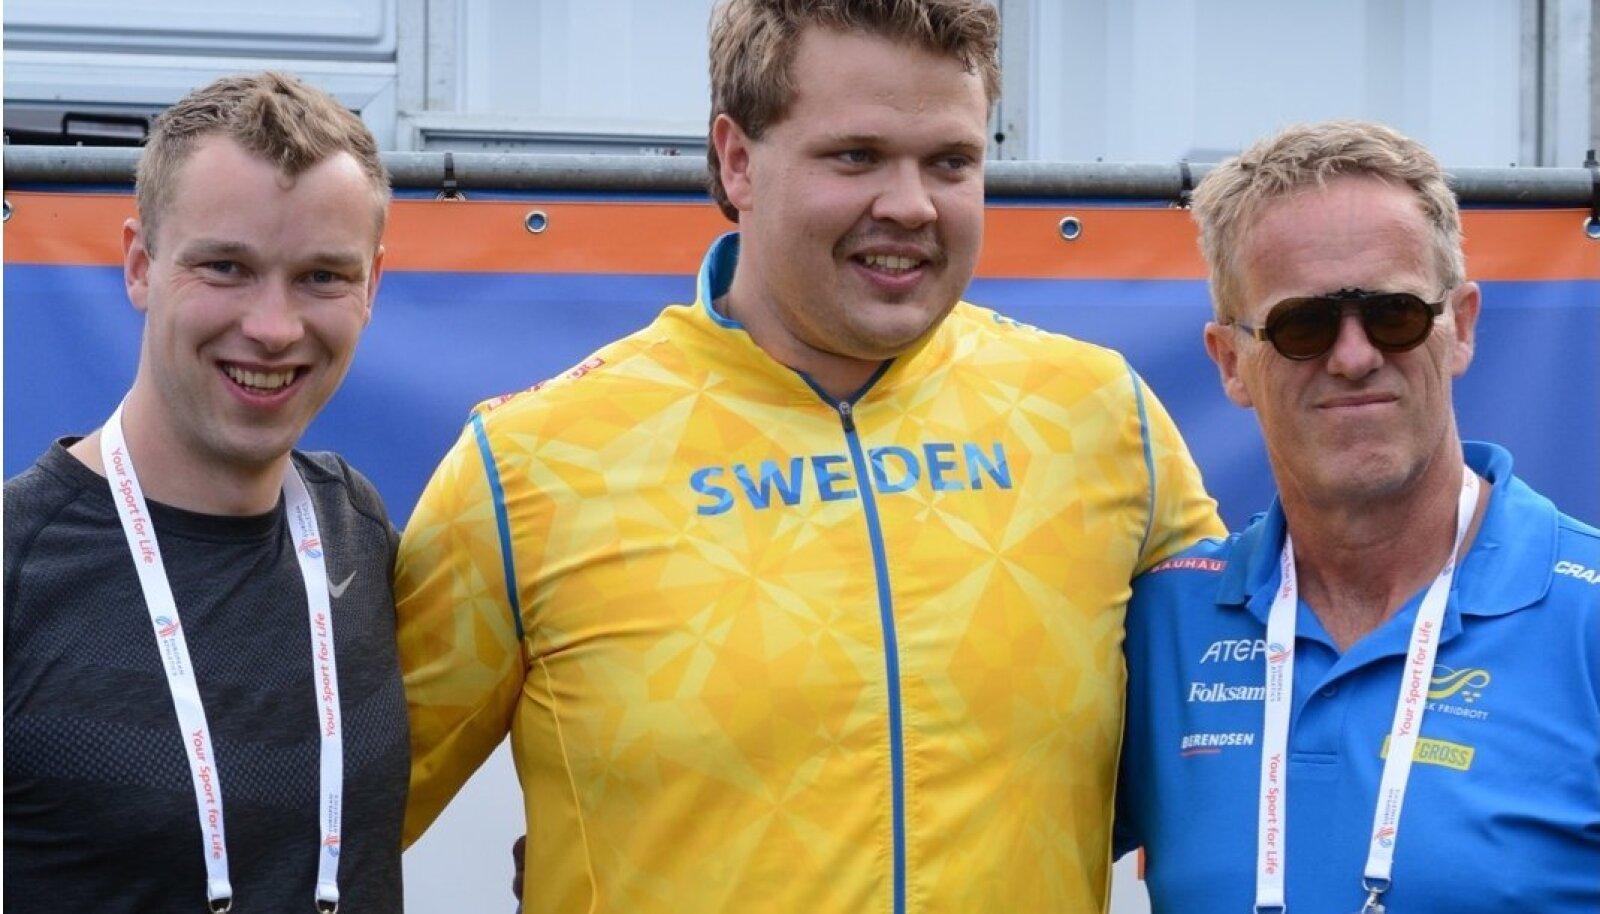 Hans Üürike, Daniel Stahl ja Vesteinn Hafsteinsson ühispildil.